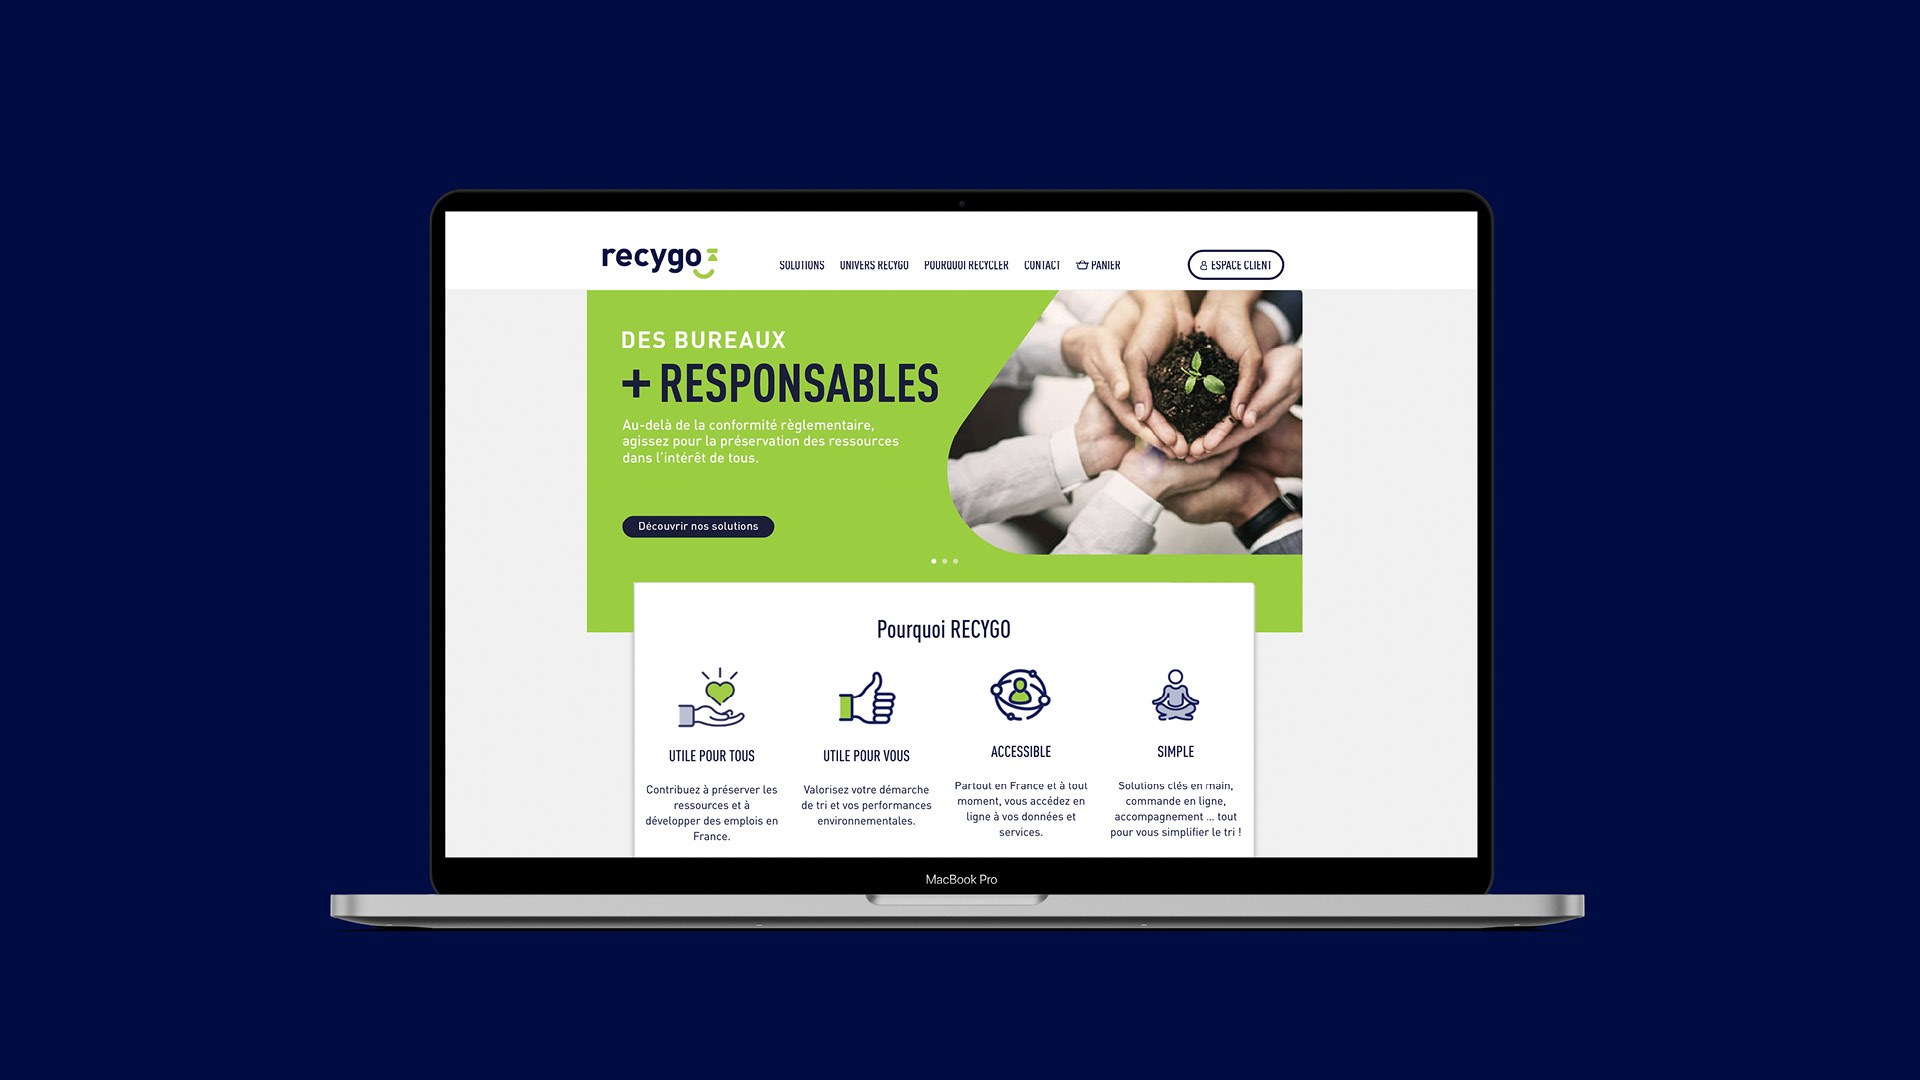 recygo_casclient_20